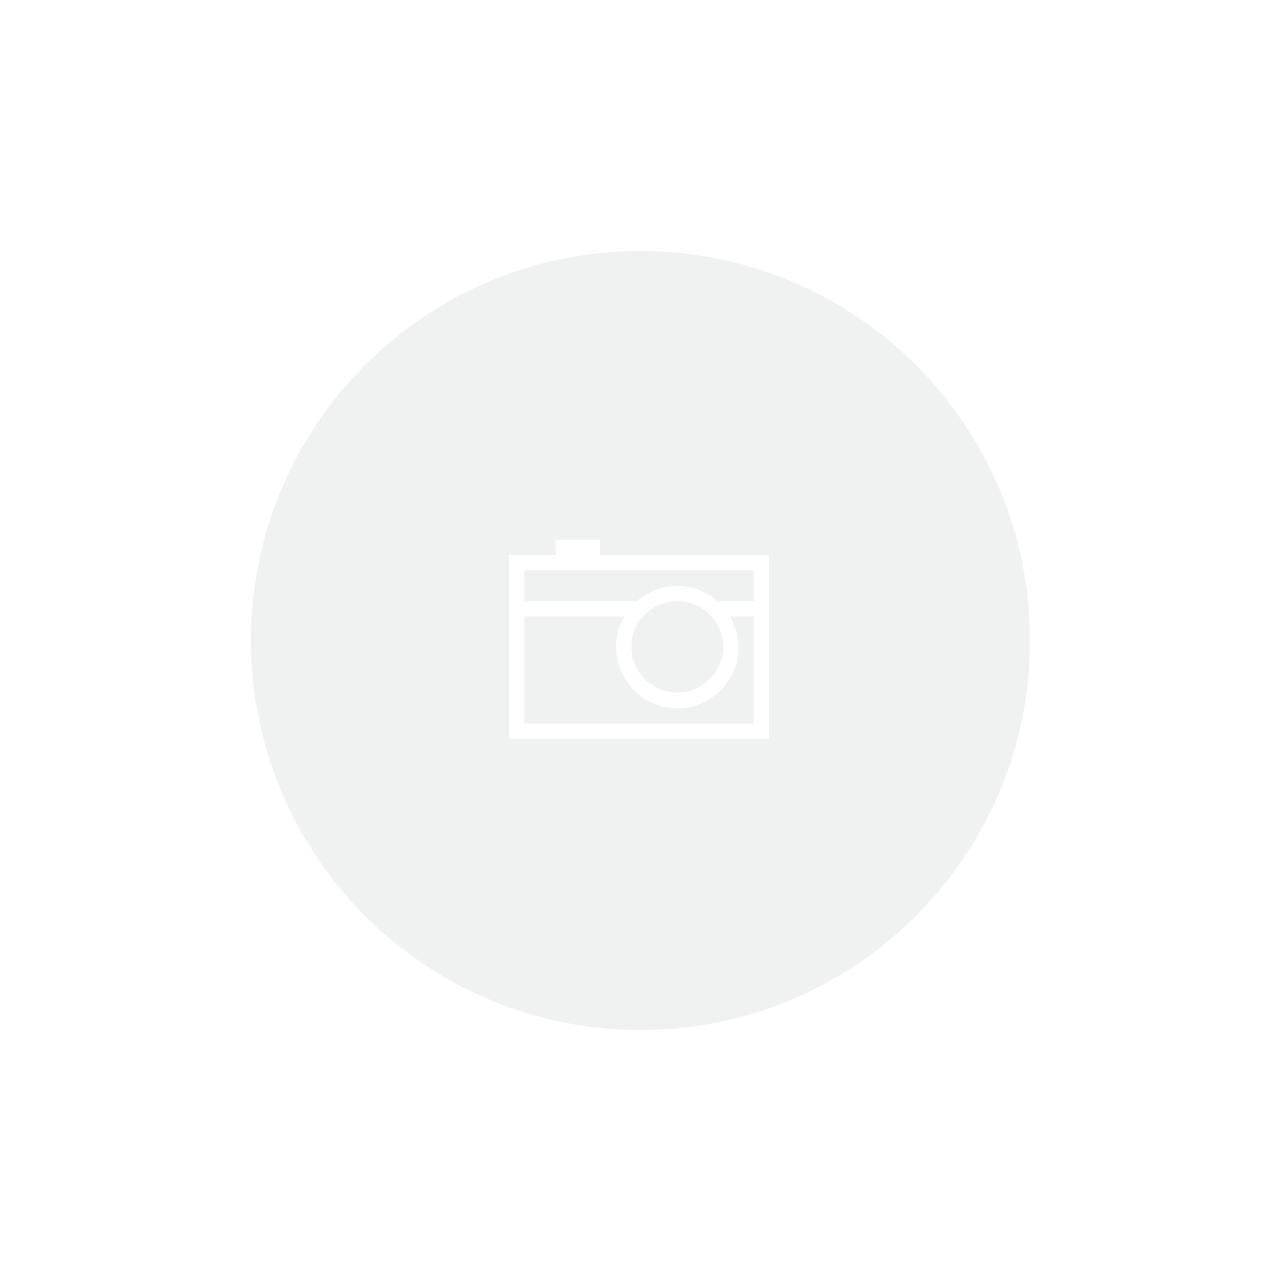 BICICLETA 29 BMC SPEEDFOX 02 CARBON NX EAGLE 12V 2019